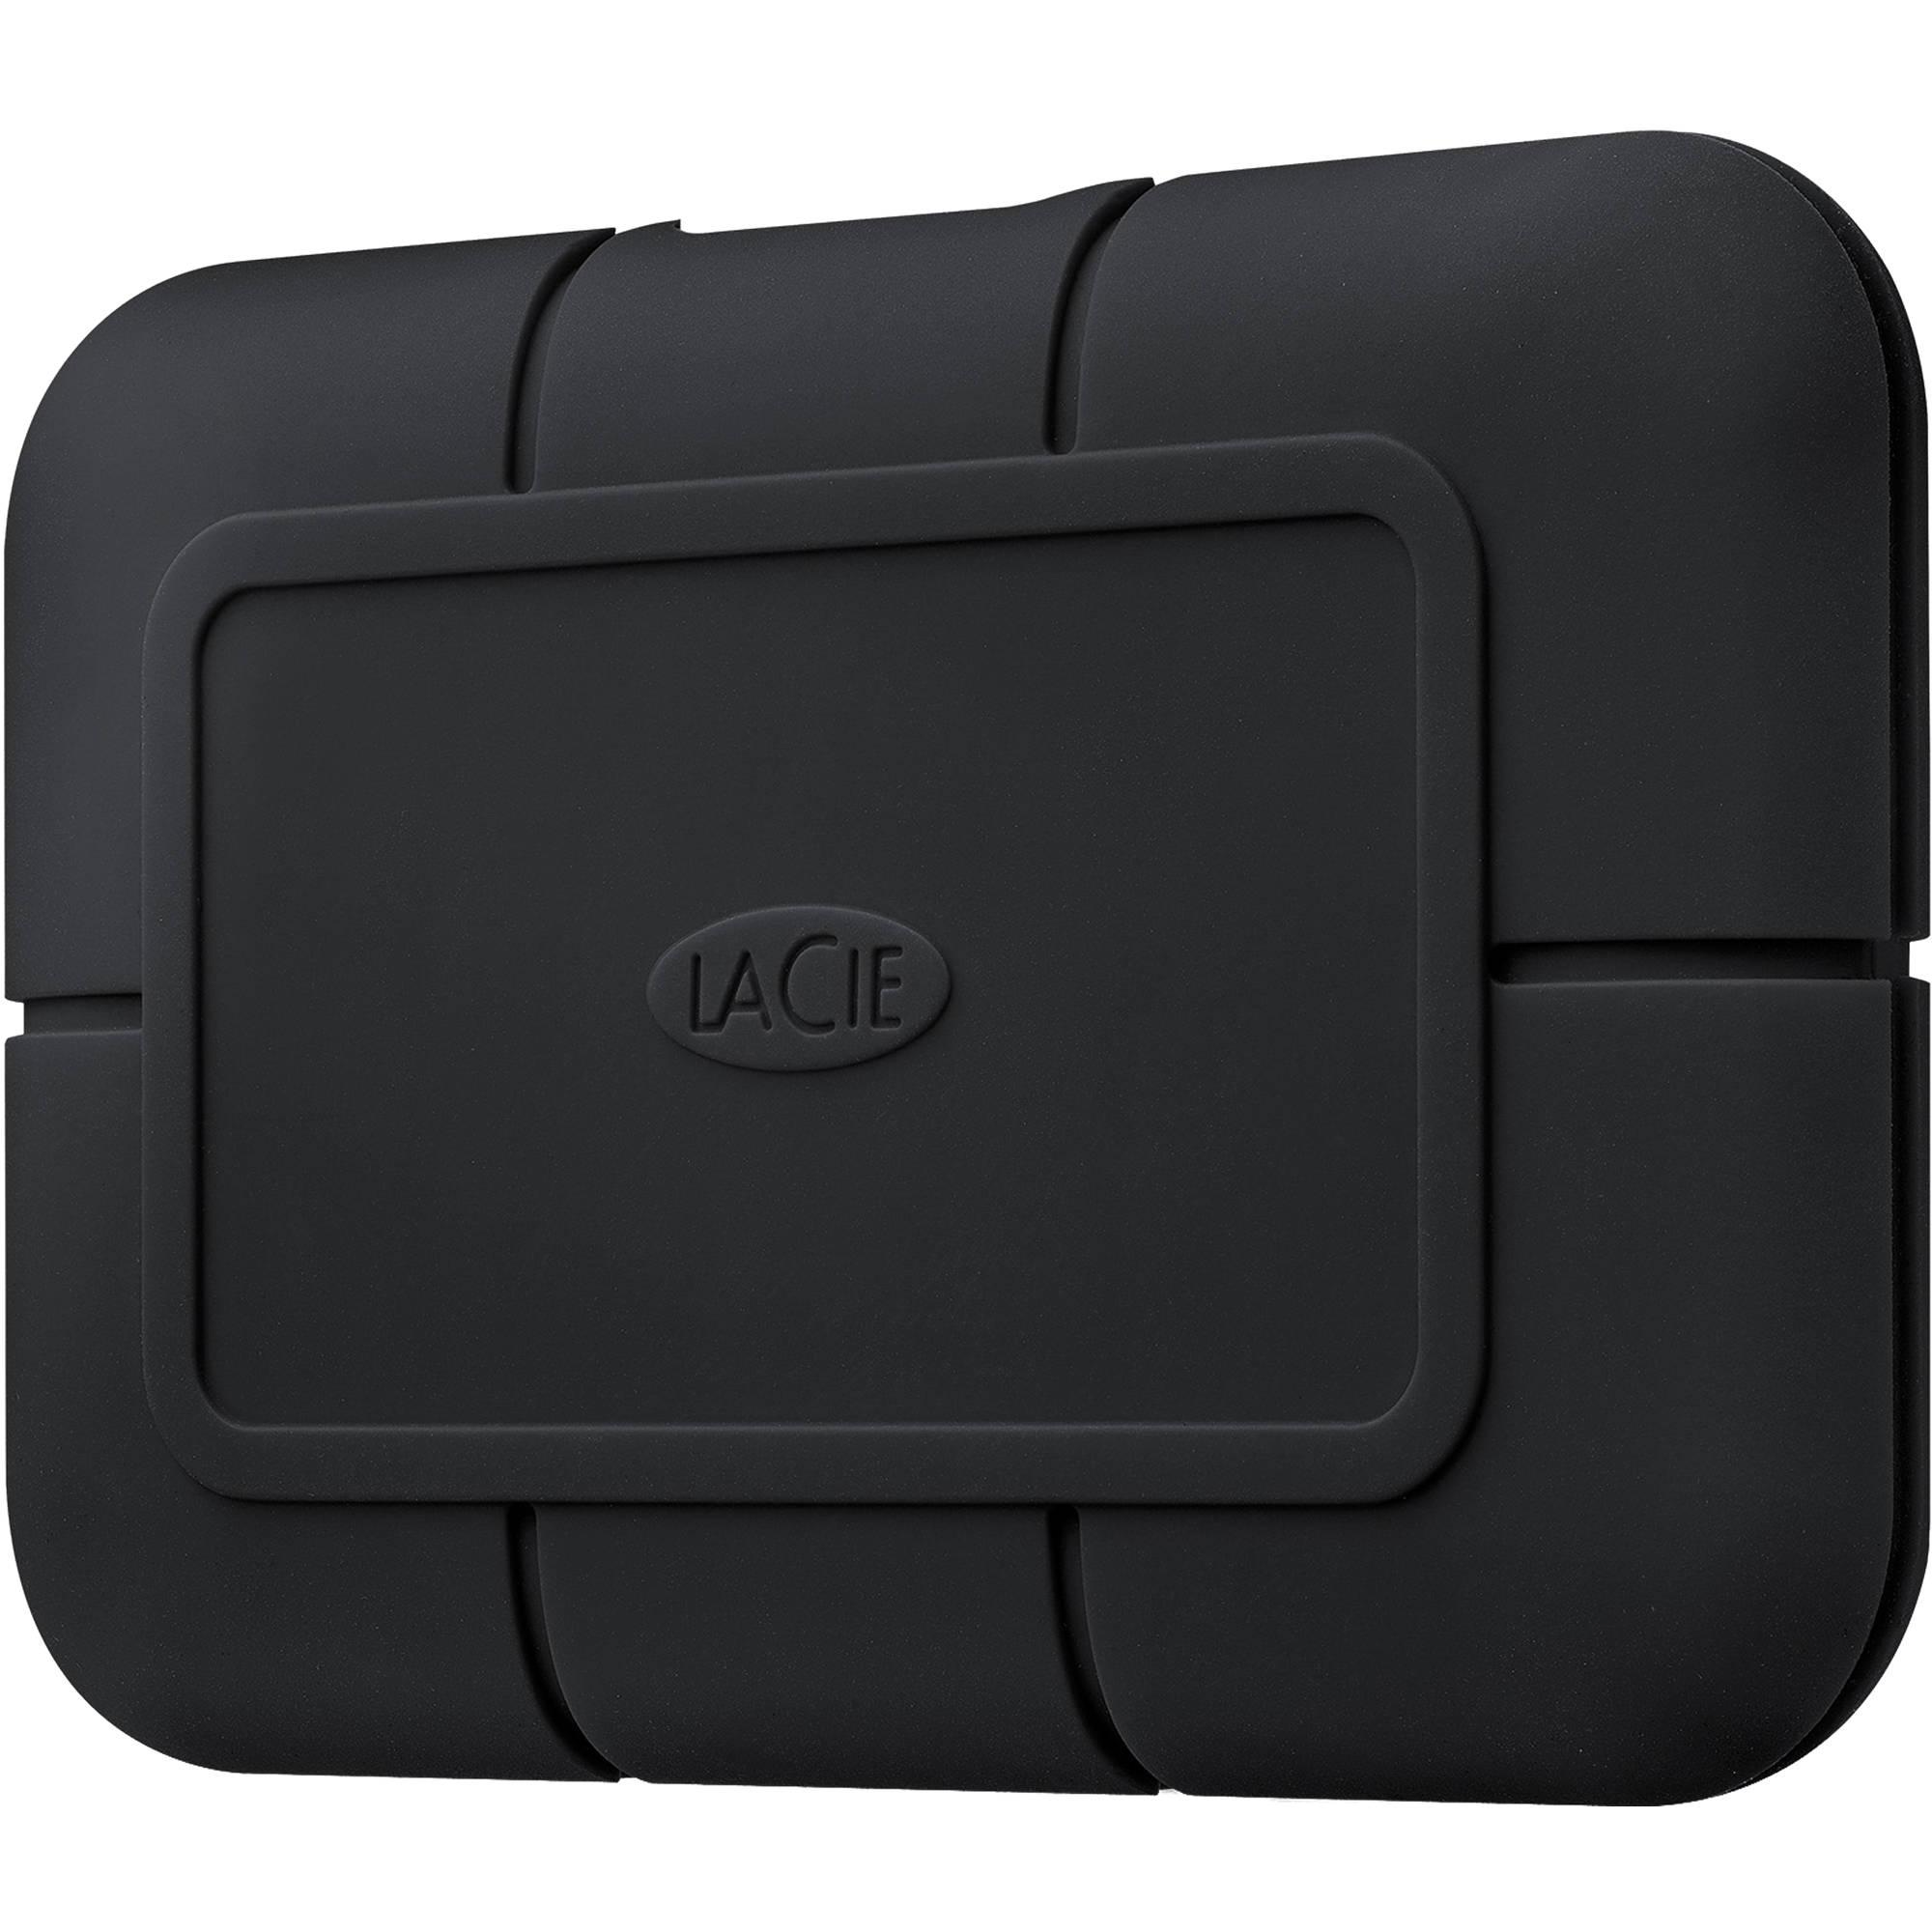 Lacie 1tb Rugged Ssd Pro Thunderbolt 3